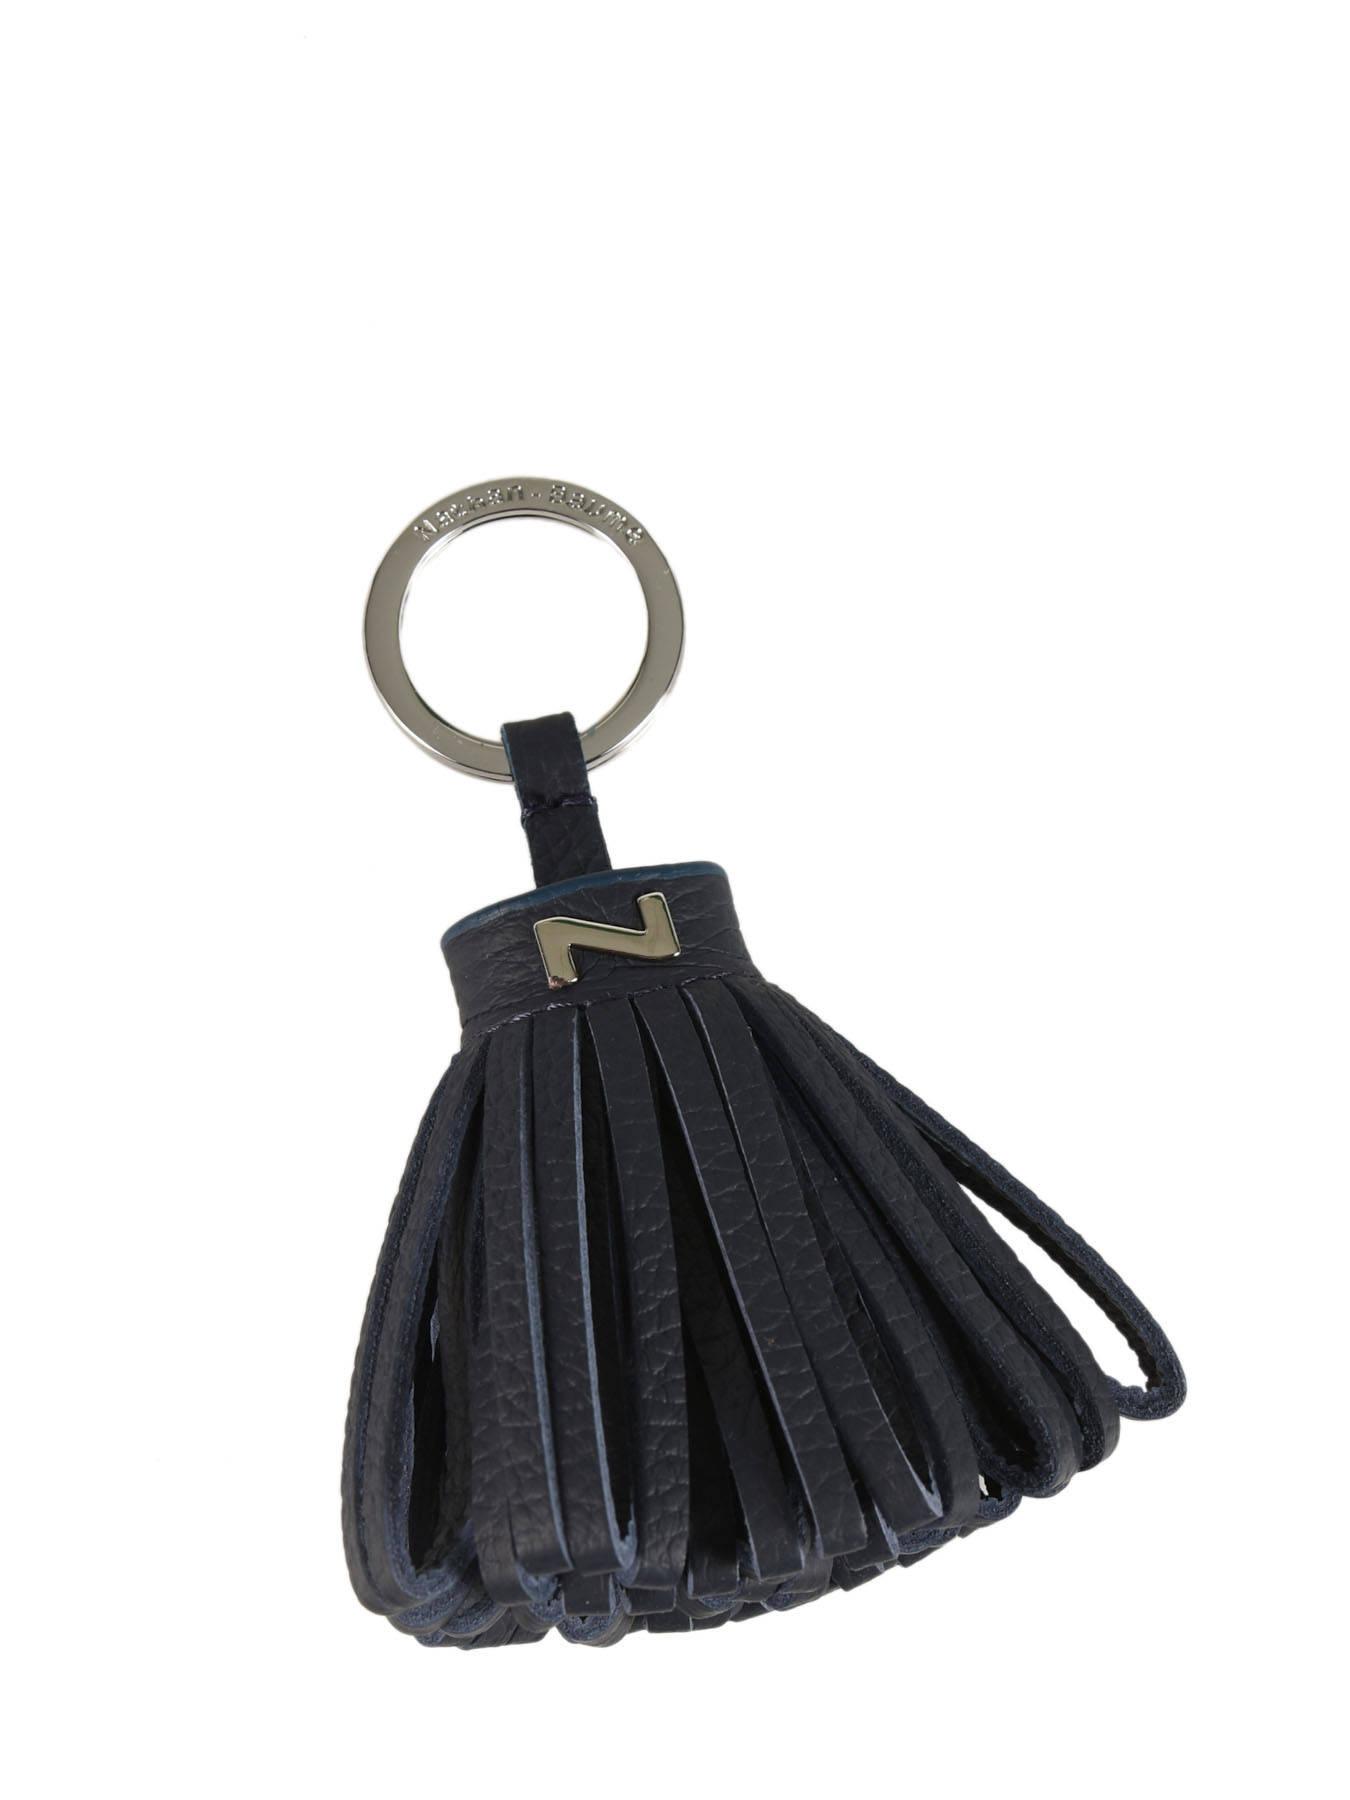 ... Porte-clefs Cuir Nathan baume Noir original gold 530100N ... 2050cd28a7c